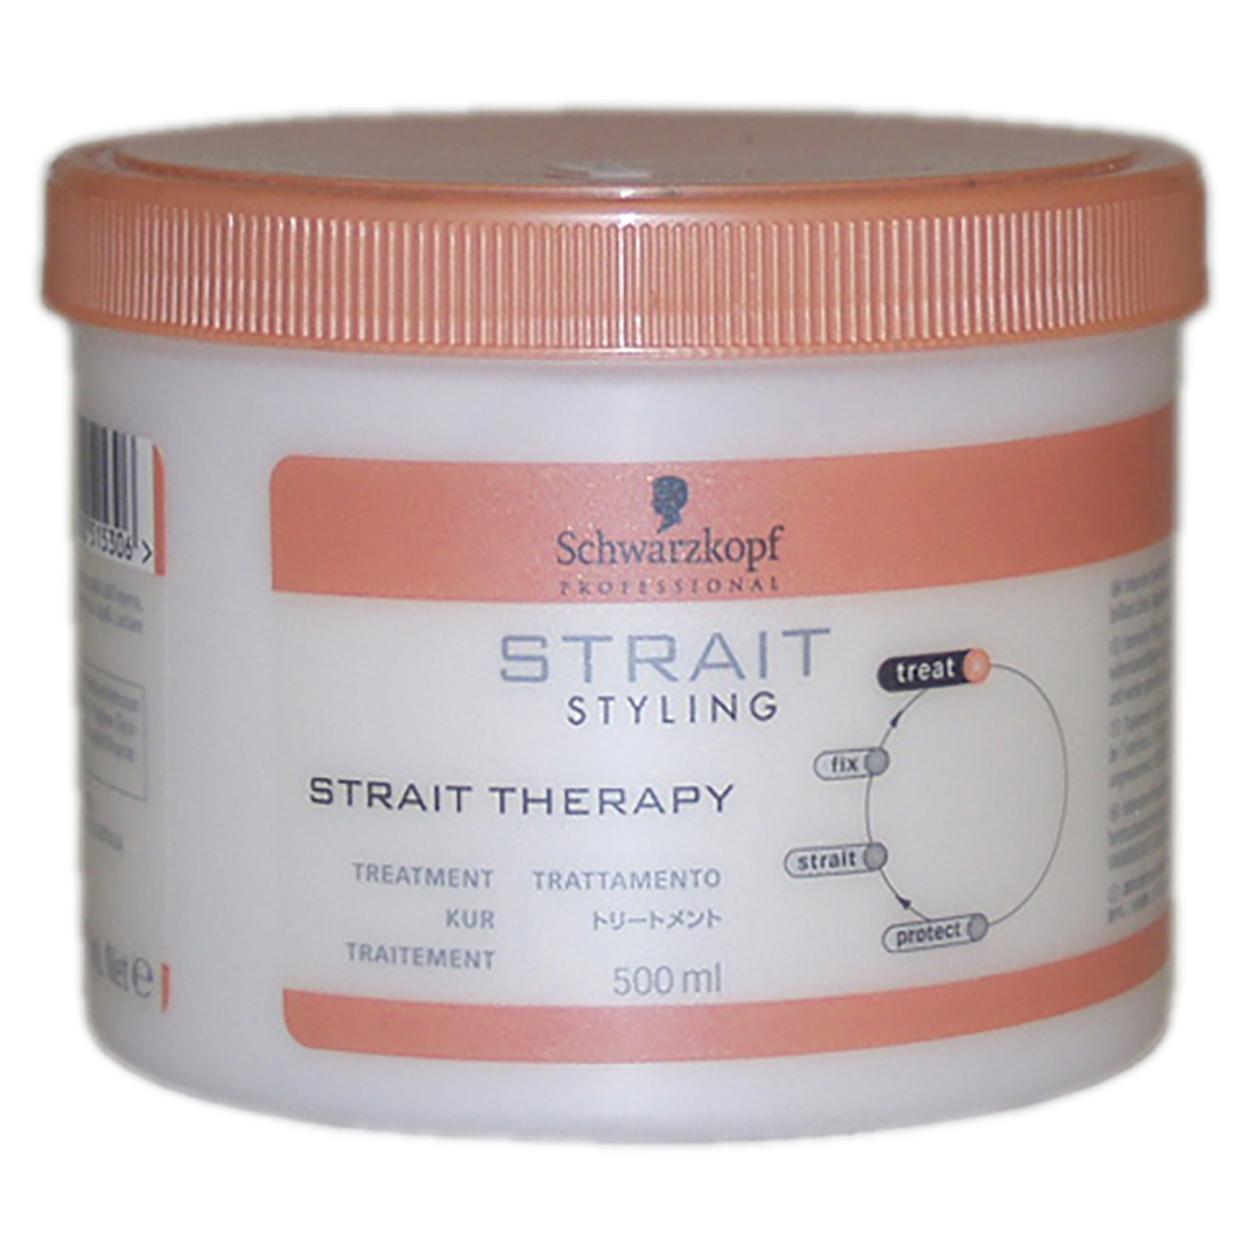 Strait Styling Strait Therapy Treatment By Schwarzkopf For Unisex 16.9 Oz Treatment